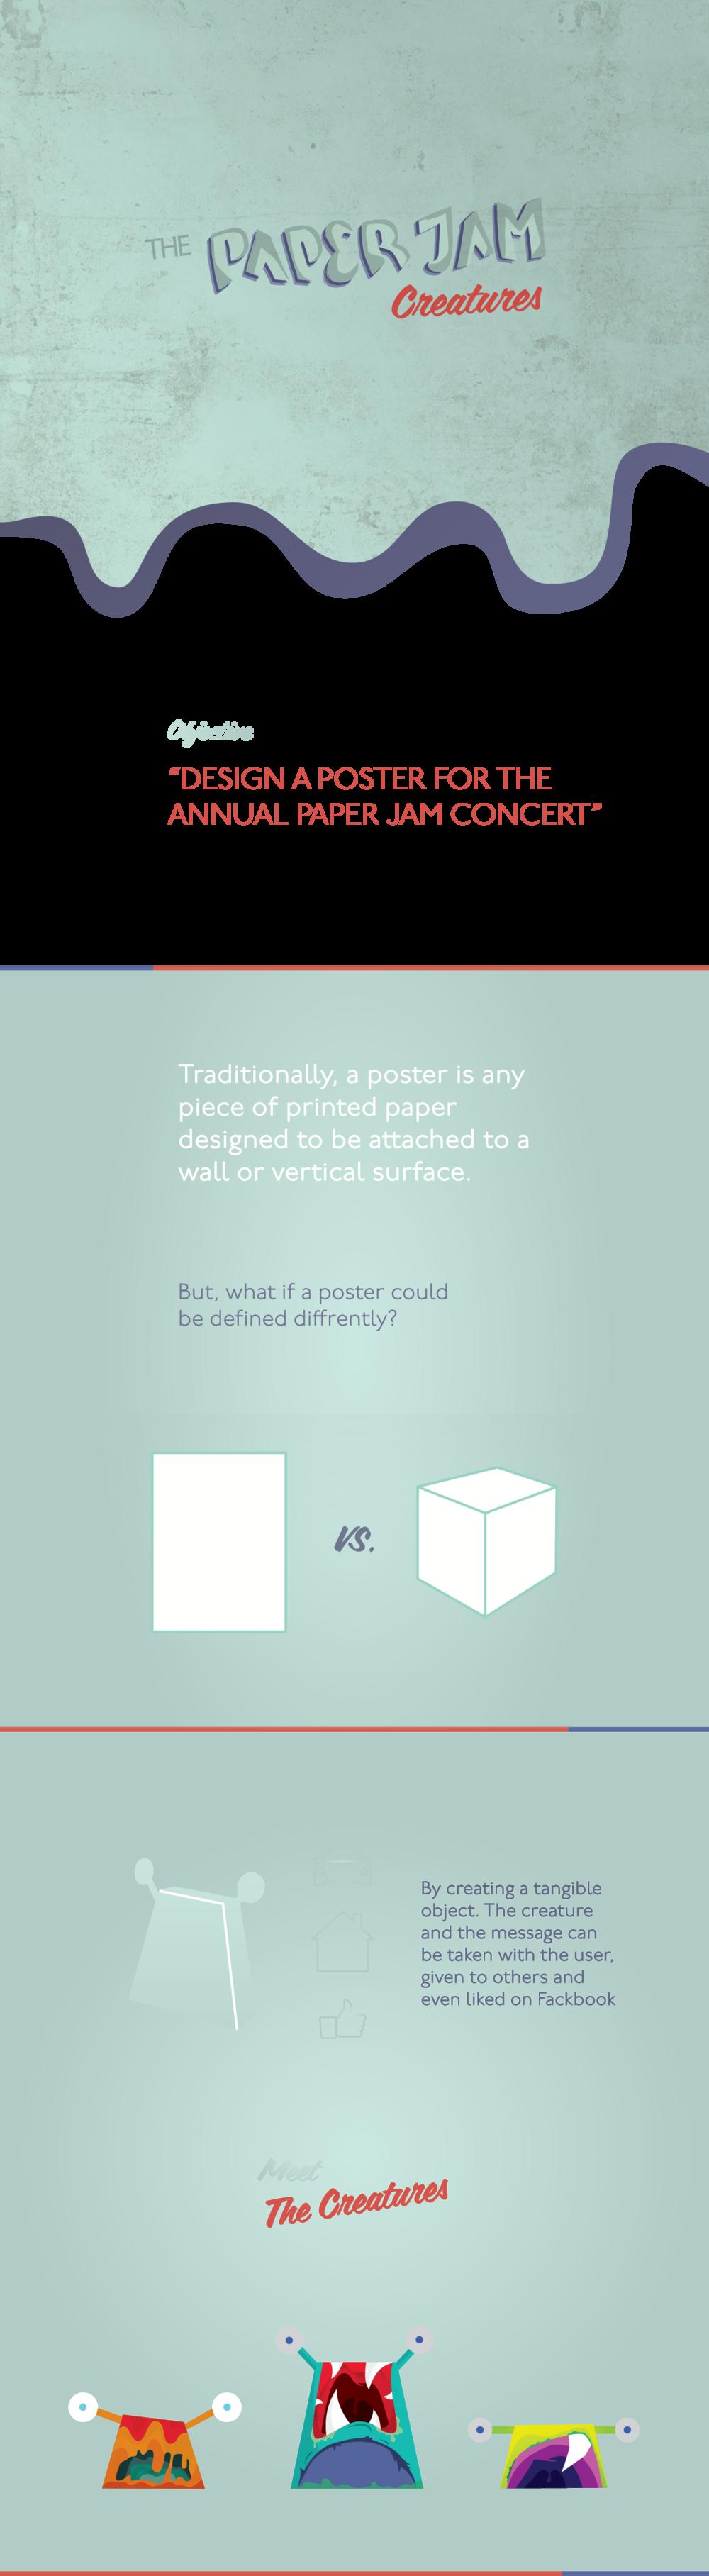 Paper Jam - Squarespace-01.png